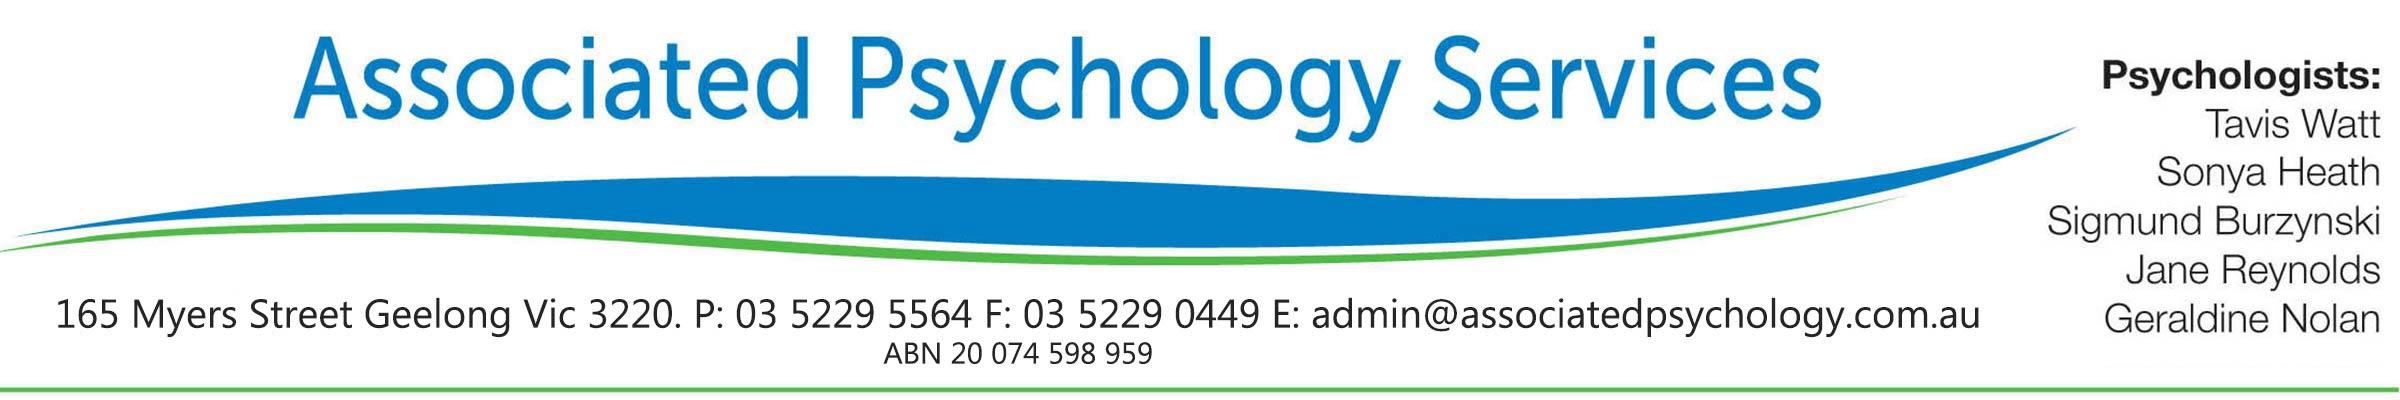 associated psychology services logo